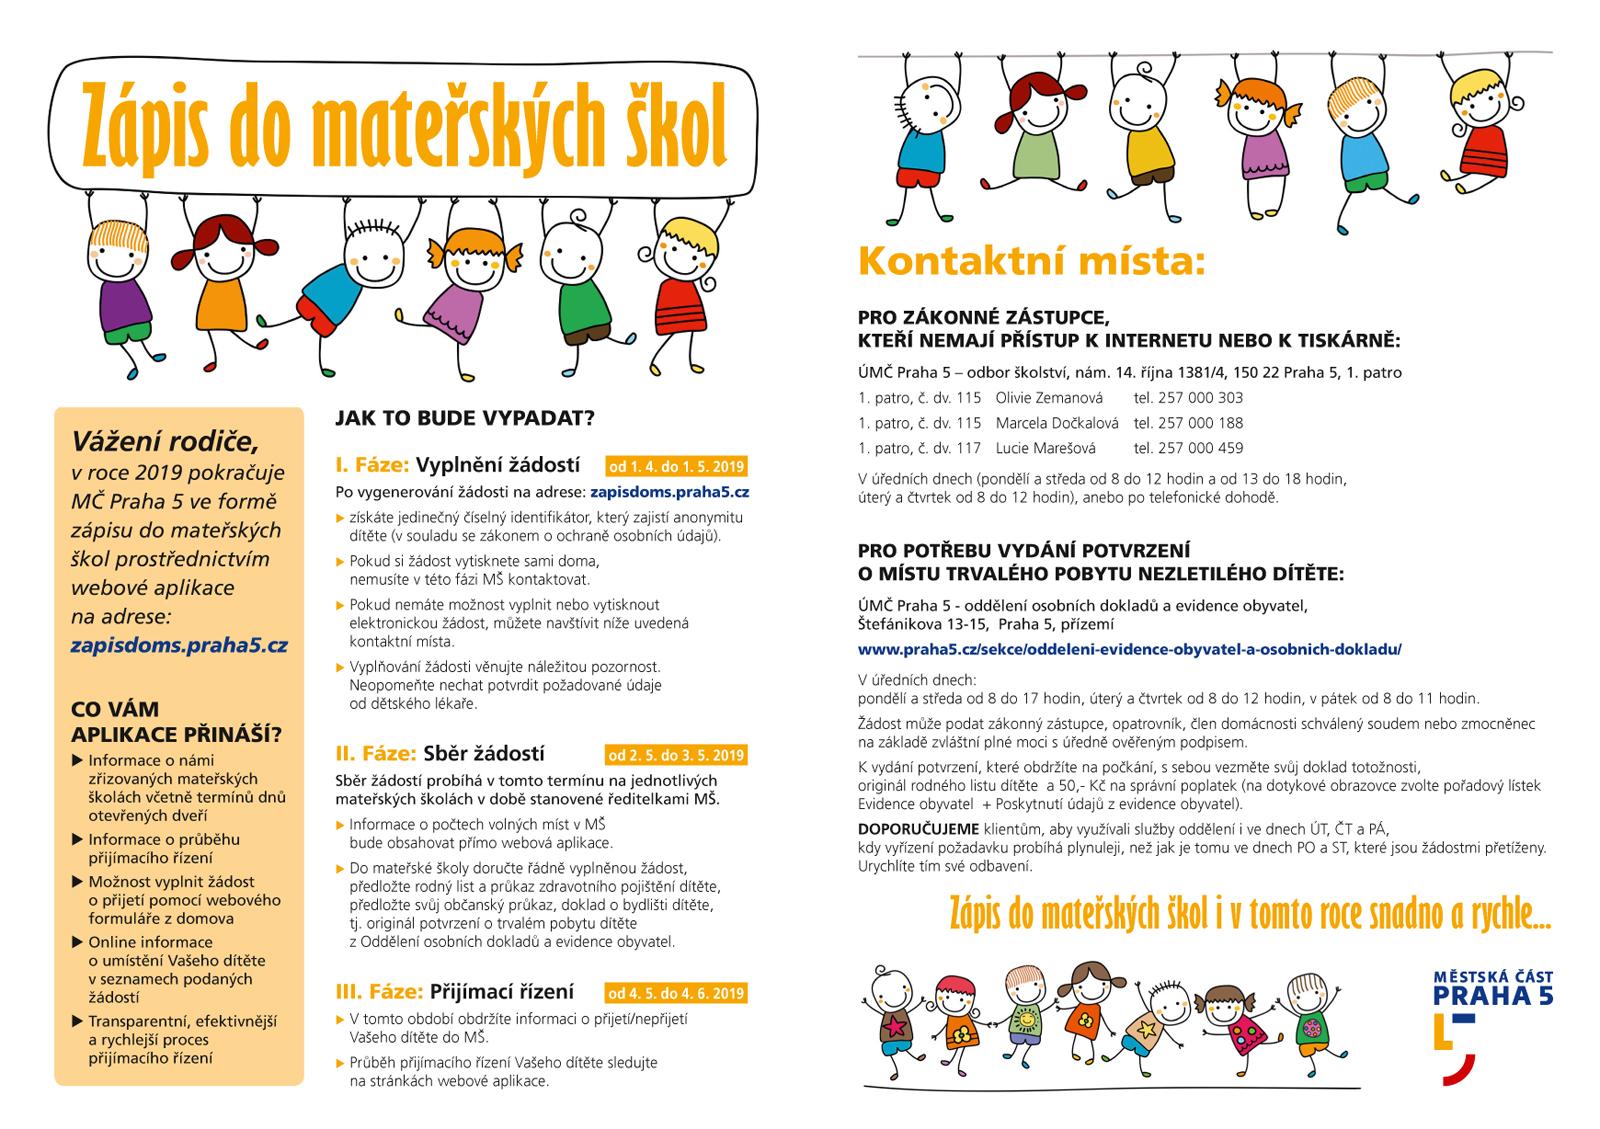 zapis-do-materskych-skola-na-praze-5-usnadni-webova-aplikace